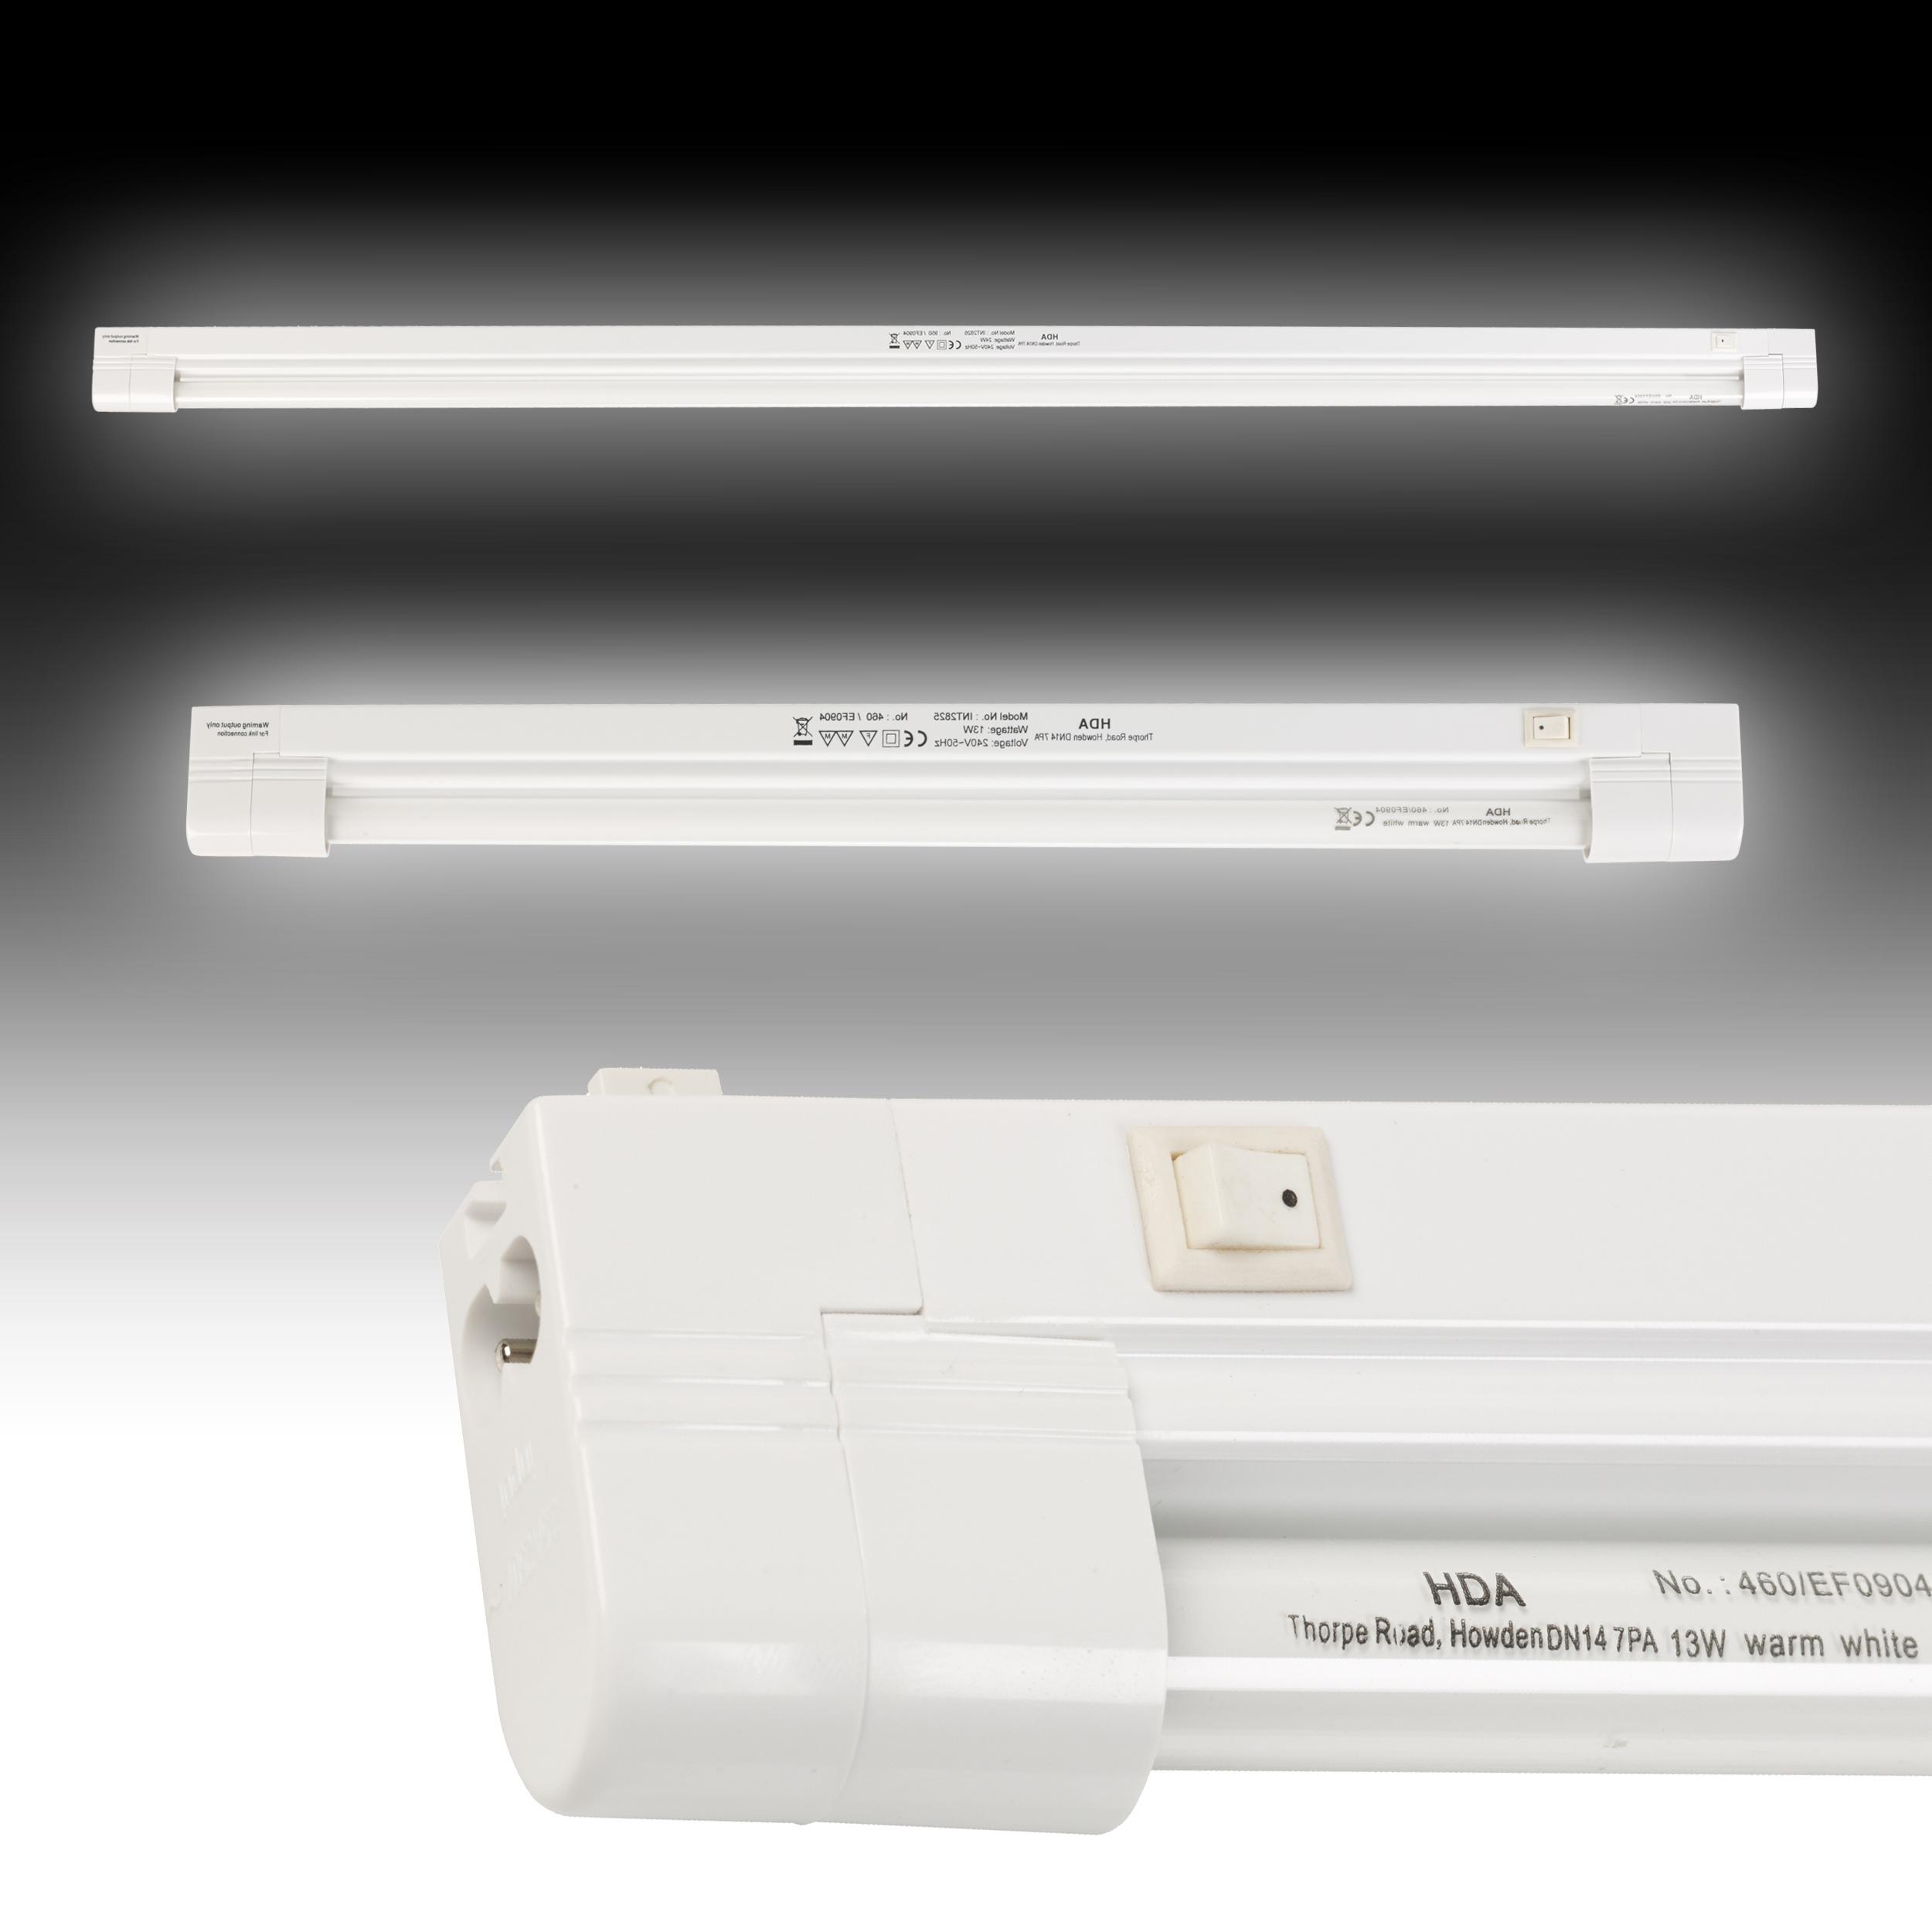 Linkable T5 Fluorescent Batten For Use Under Kitchen Cabinets: 460mm 13W Fluorescent T5 Tube Link Light Strip Slimline